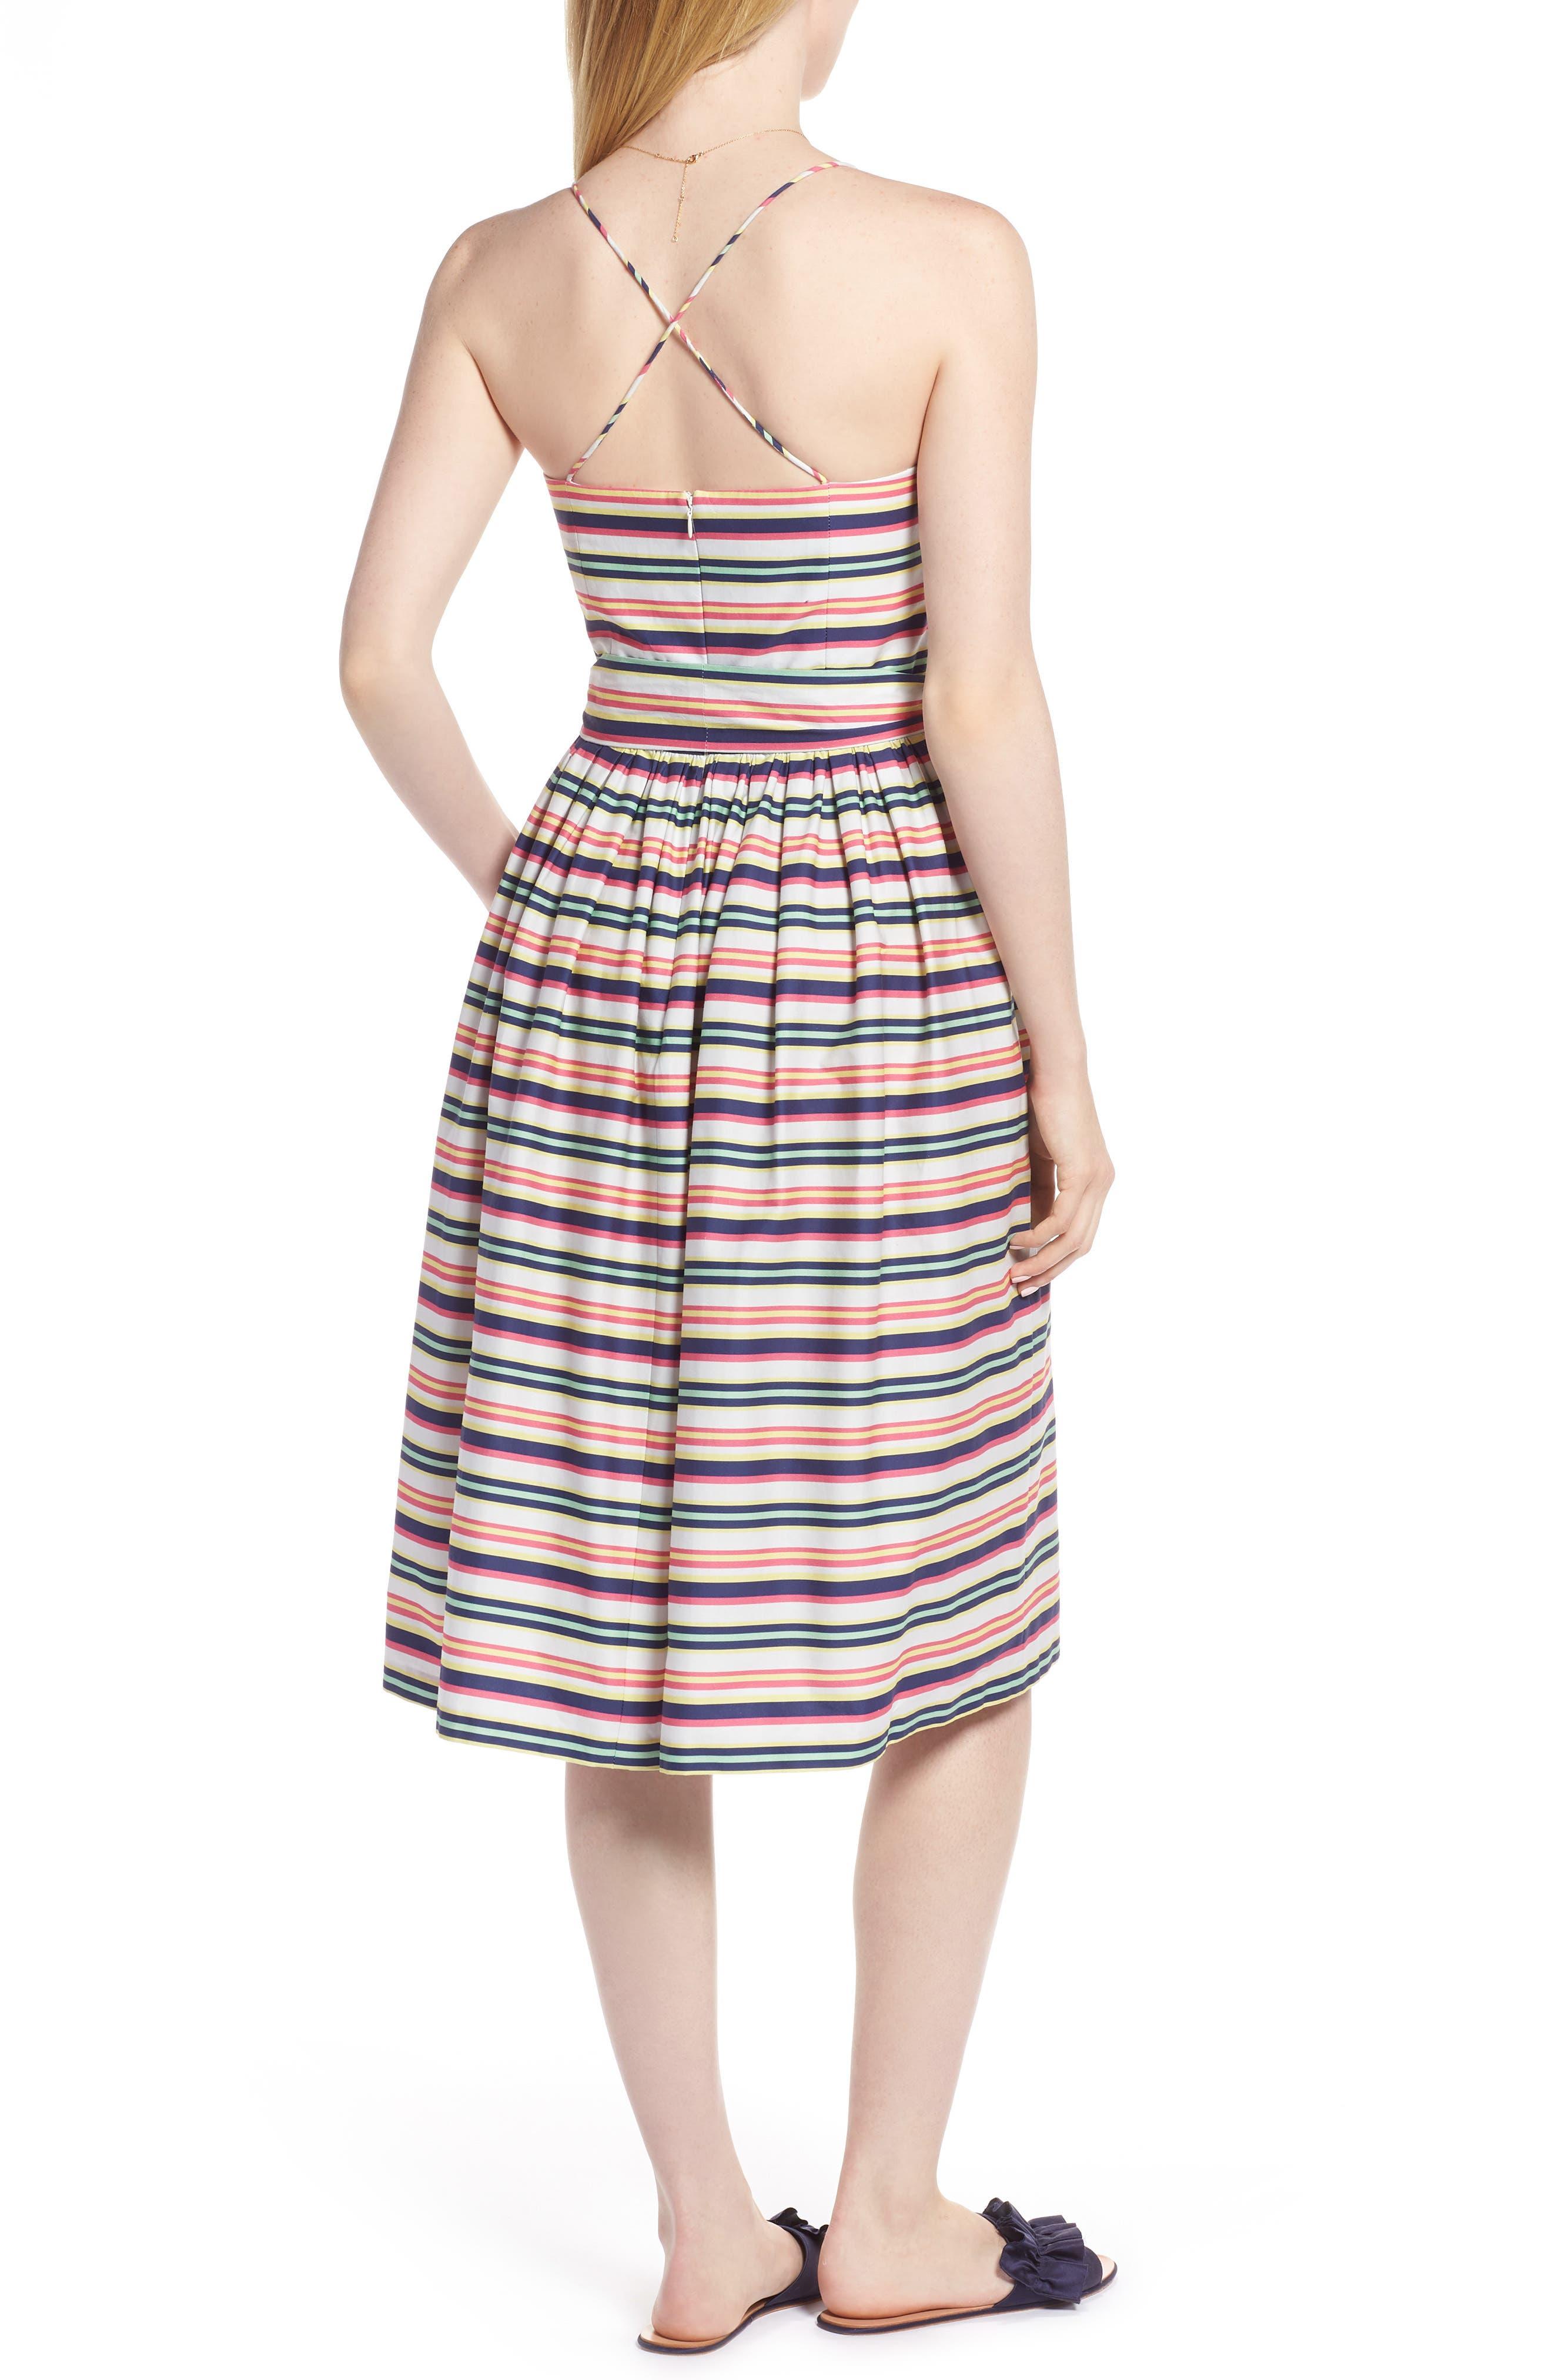 Stripe Strappy Cotton Dress,                             Alternate thumbnail 2, color,                             NAVY PINK COMBO STRIPE